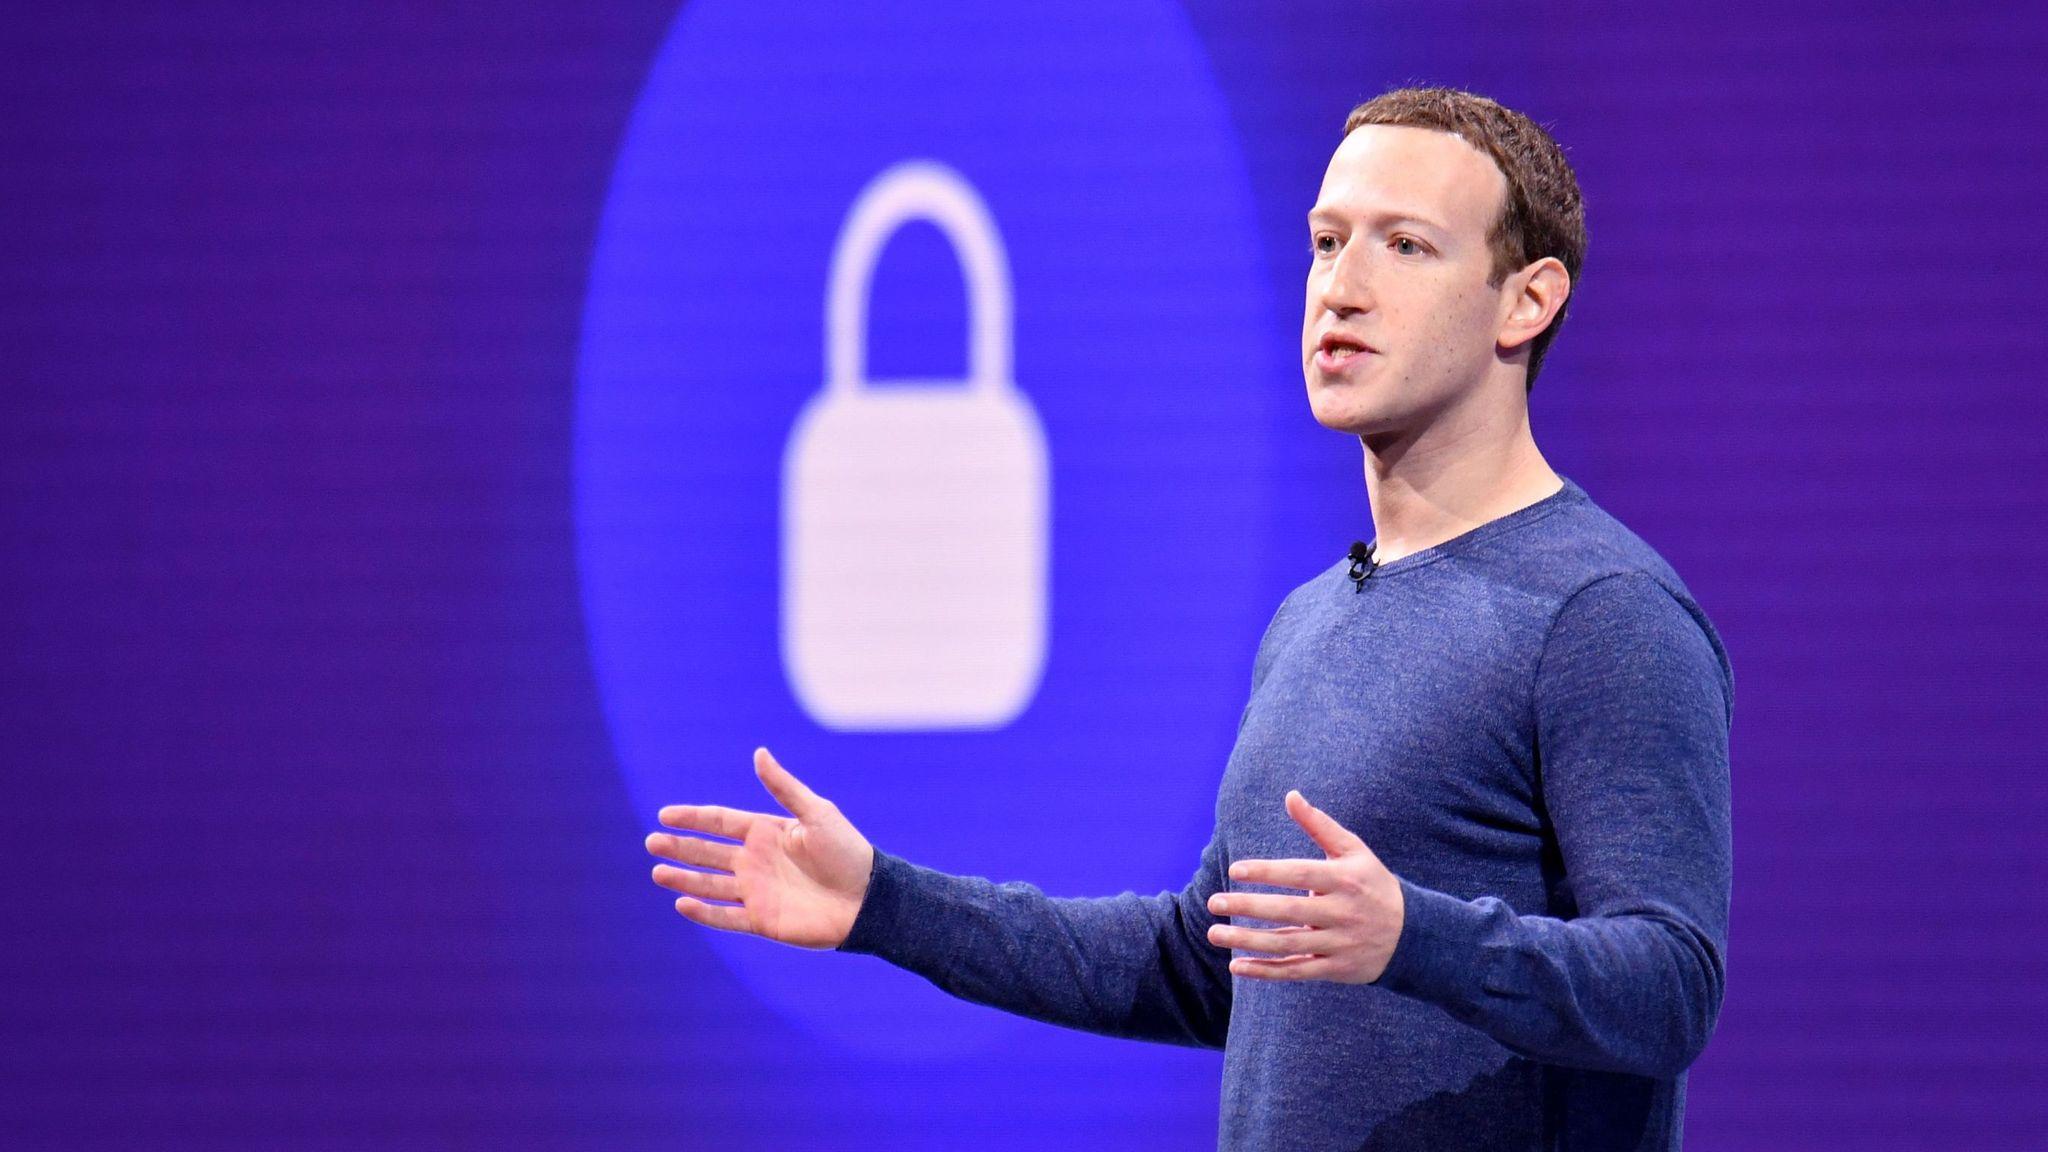 Facebook's Mark Zuckerberg joins Bill Gates and Jeff Bezos in the ...